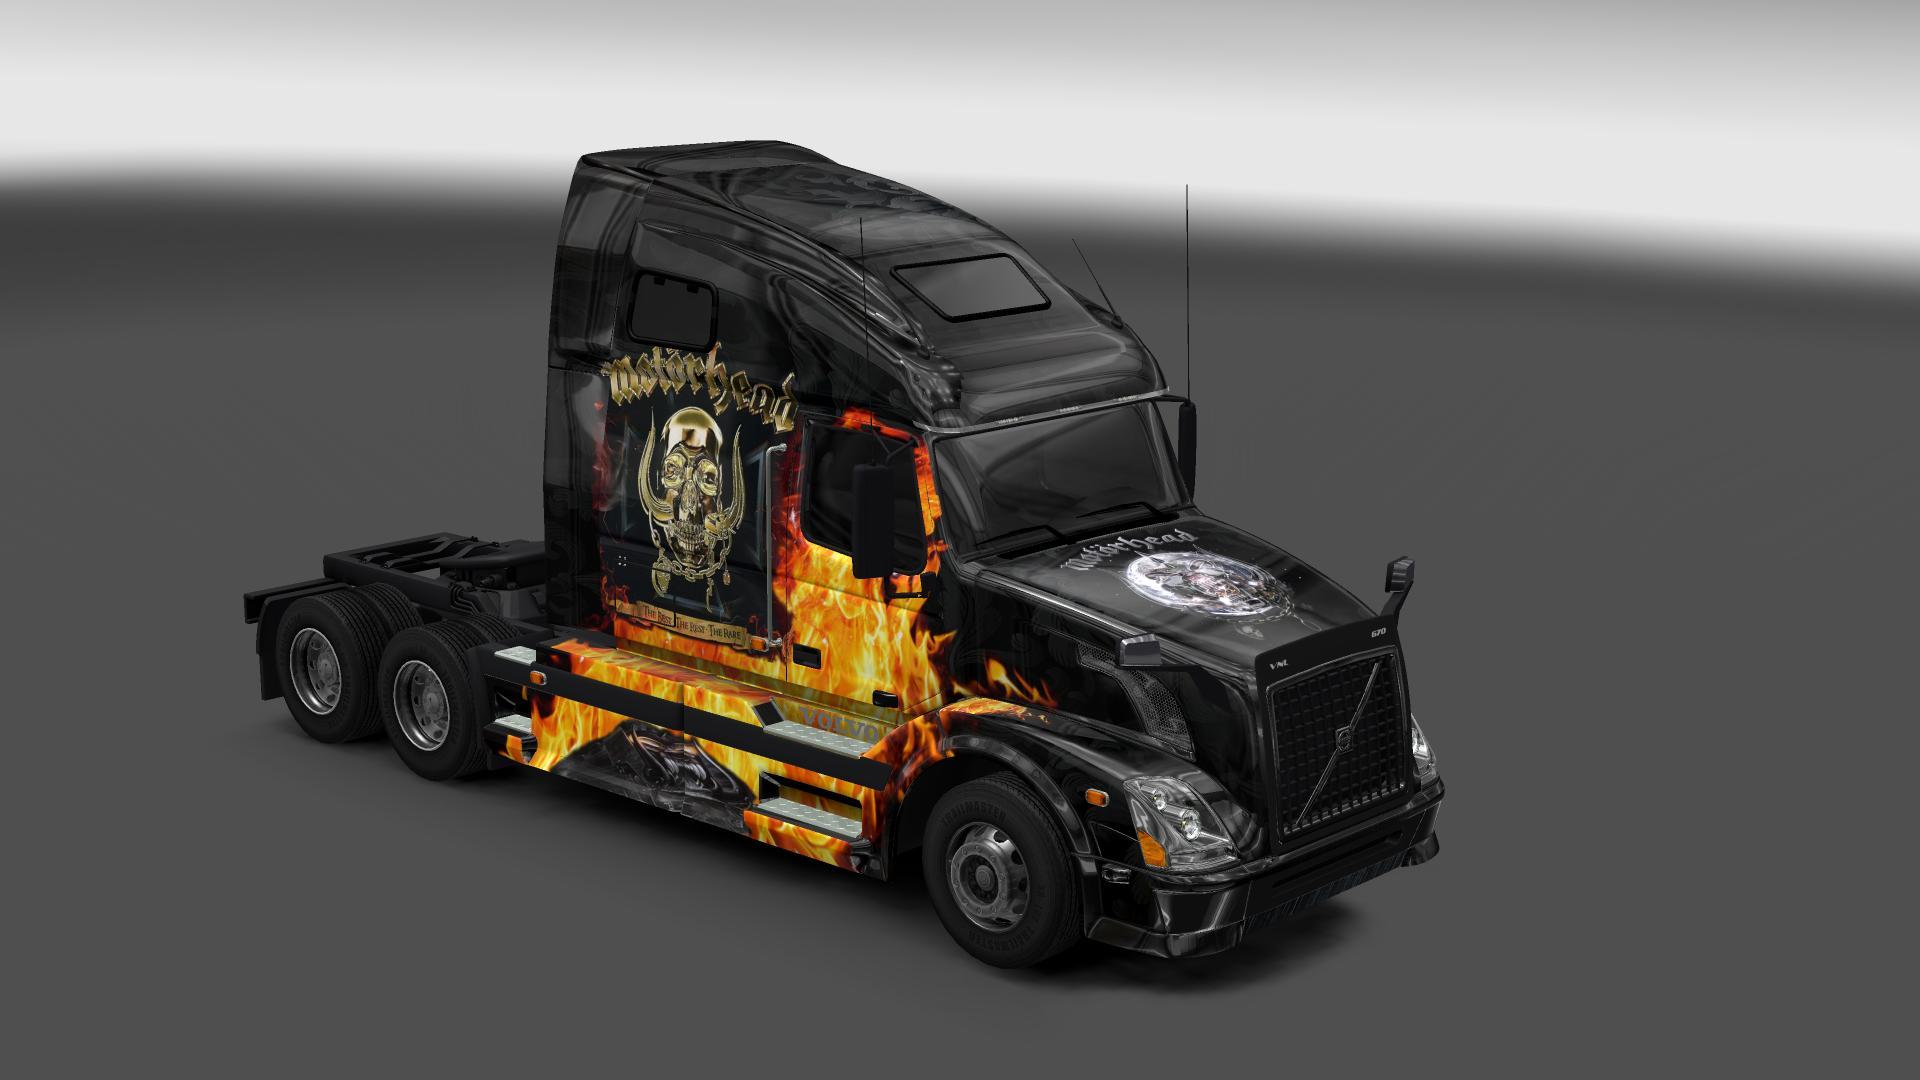 VOLVO VNL 670 MOTORHEAD SKIN Mod -Euro Truck Simulator 2 Mods